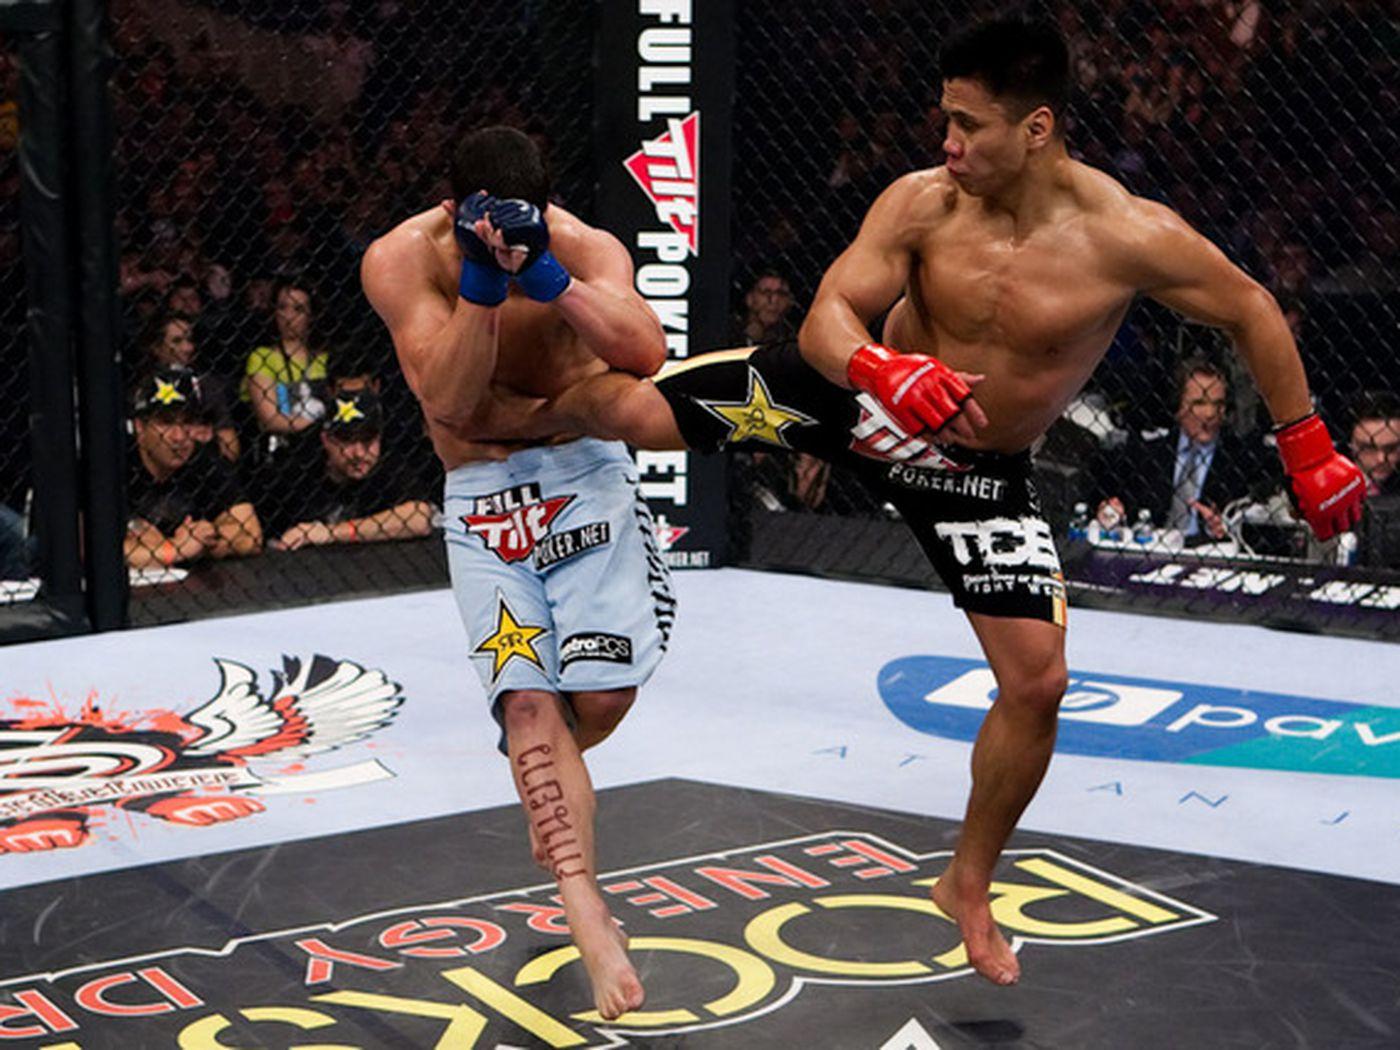 The Striking Zone Cung Le Brings Sanshou And Spinning Back Kicks